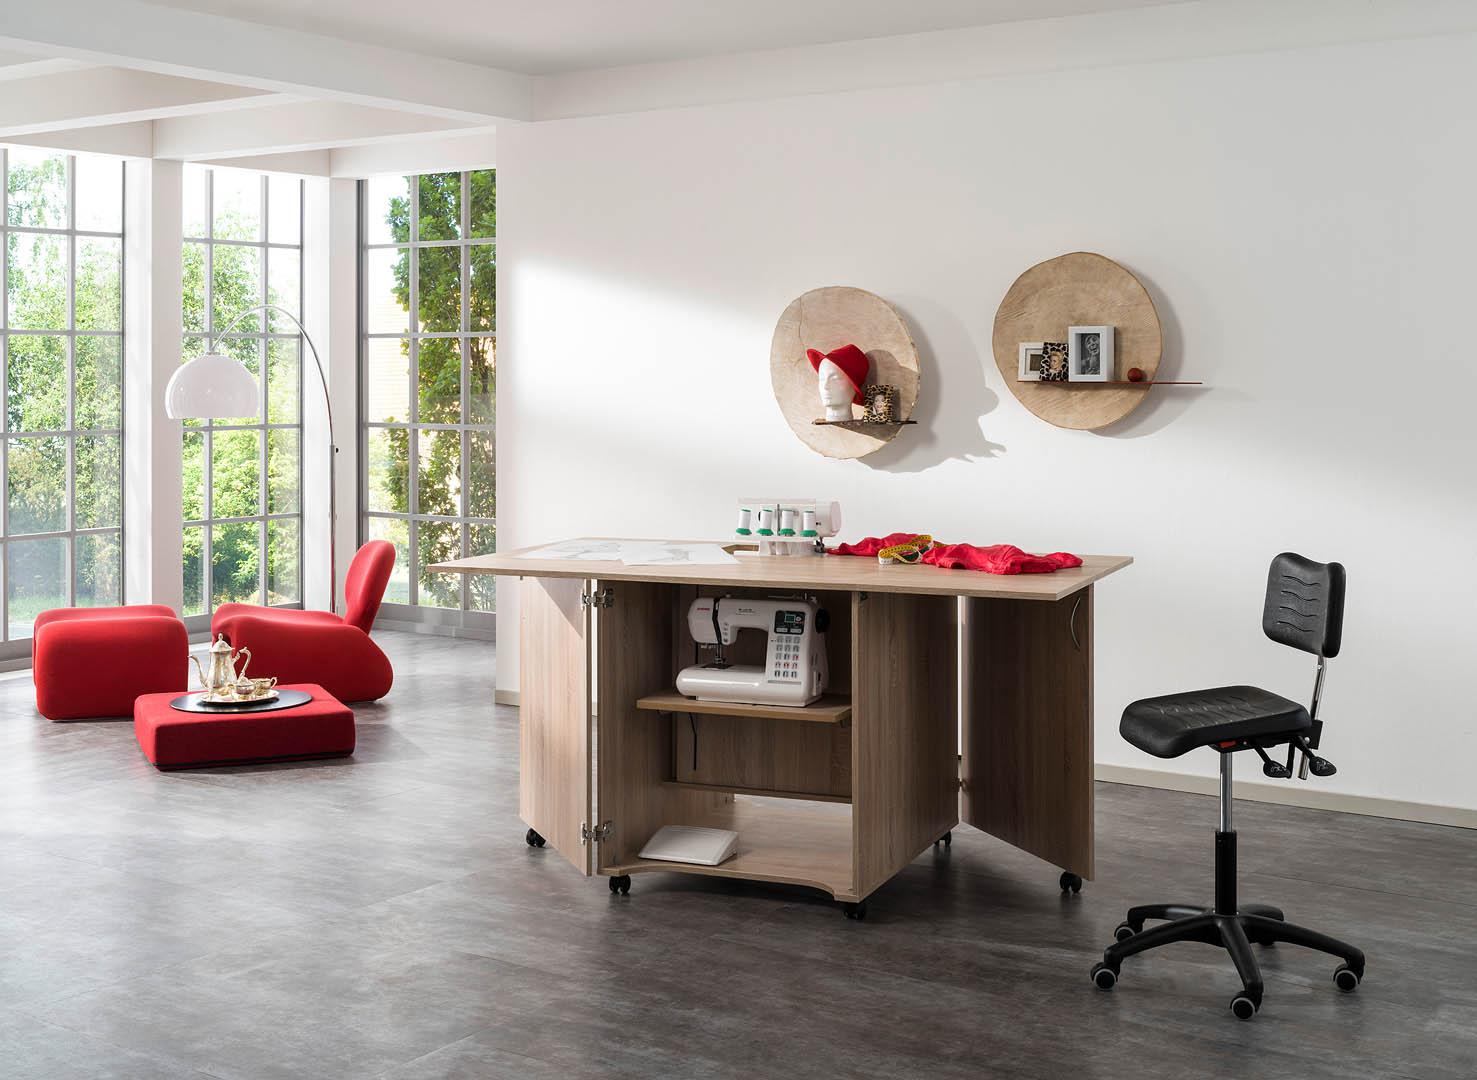 craft double mit neuem elektronischen easy softtech lift n hwelt flach. Black Bedroom Furniture Sets. Home Design Ideas